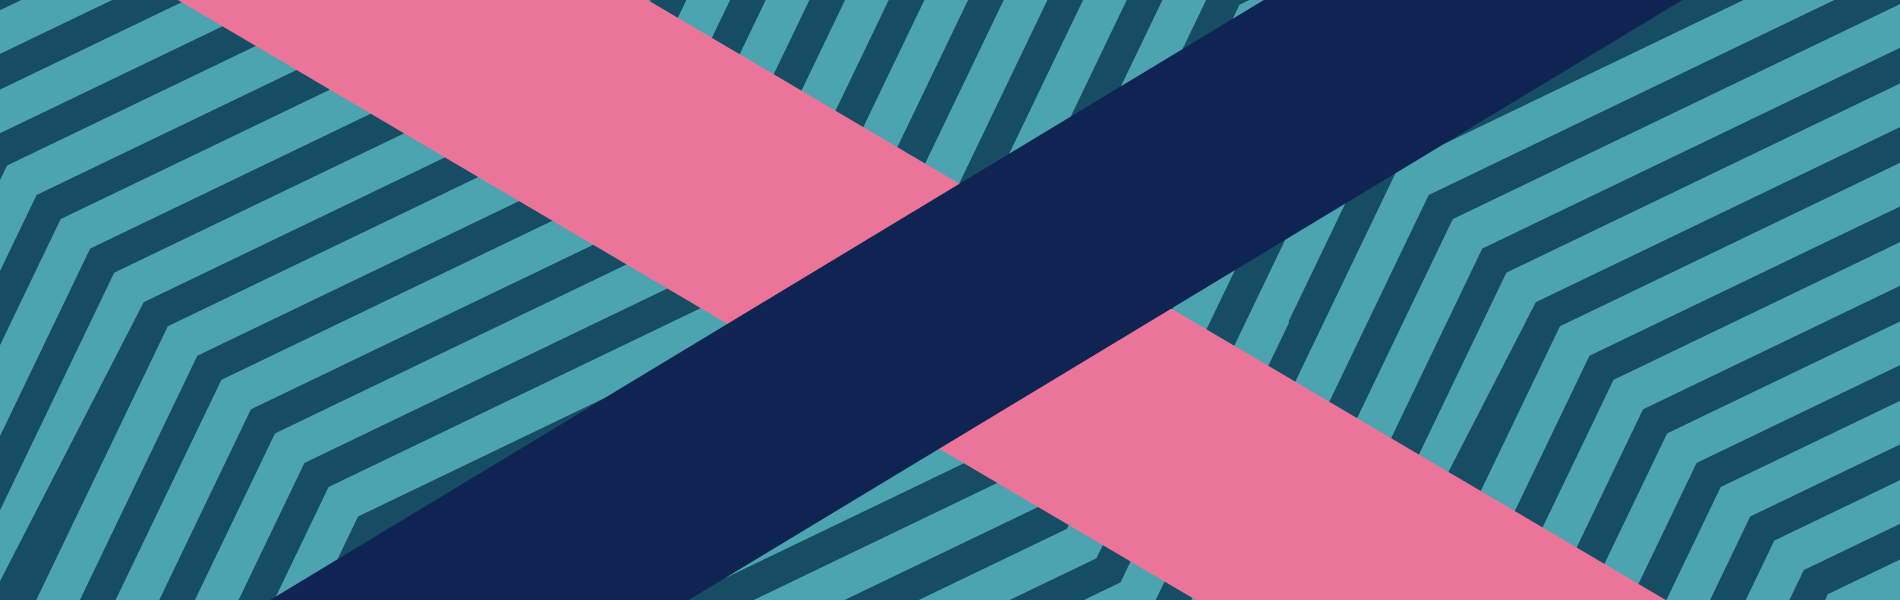 banner-fondo-01